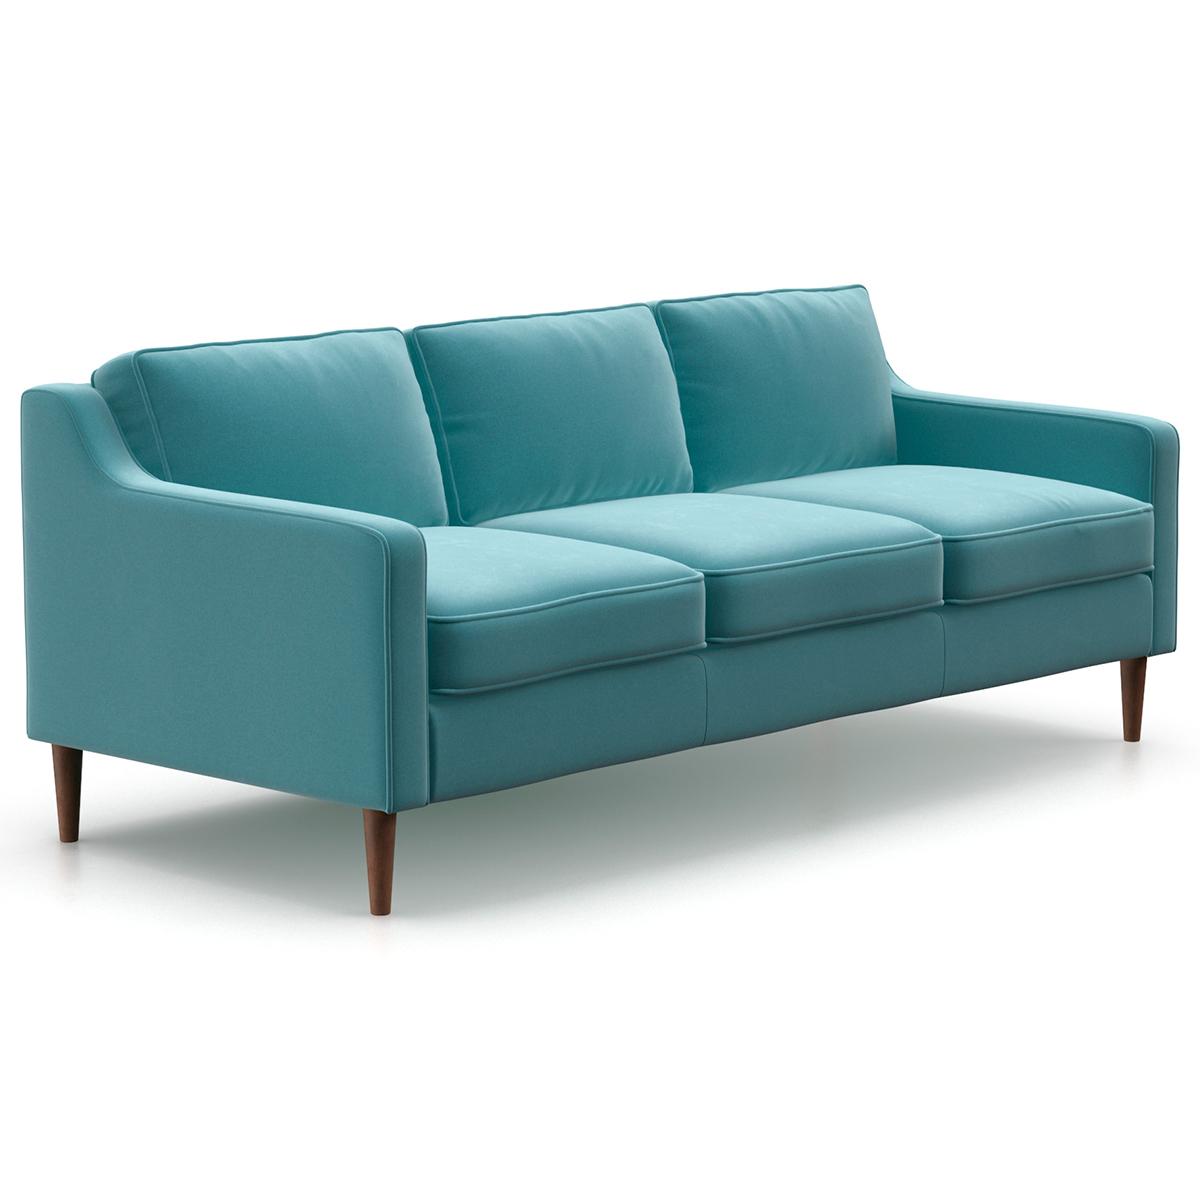 Marvelous Chase Velvet Sofa Inzonedesignstudio Interior Chair Design Inzonedesignstudiocom